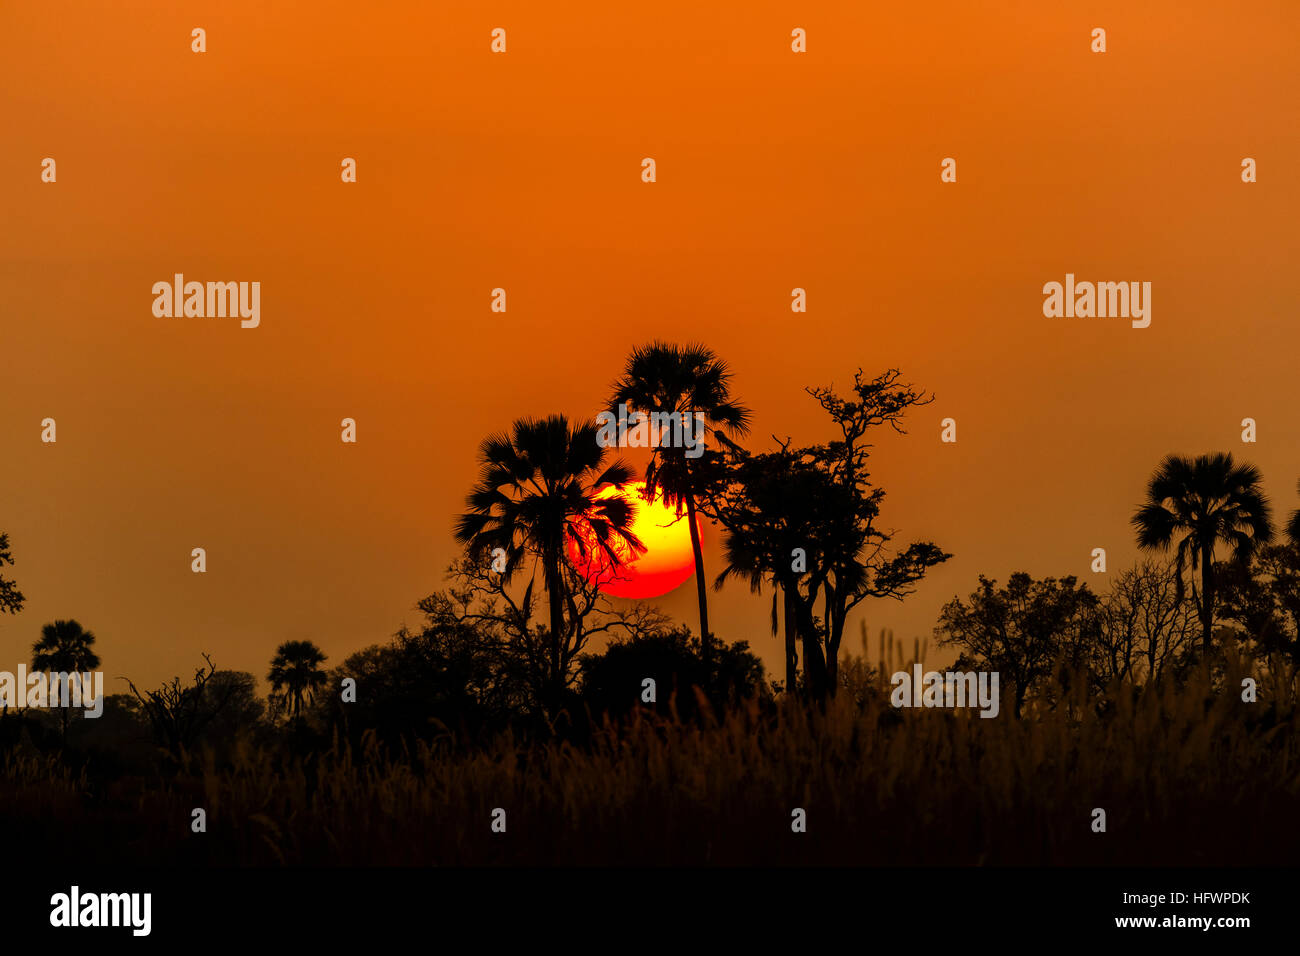 Palm trees silhouetted against the rising sun at dawn, Nxabega Concession, Okavango Delta, Kalahari, northern Botswana, - Stock Image